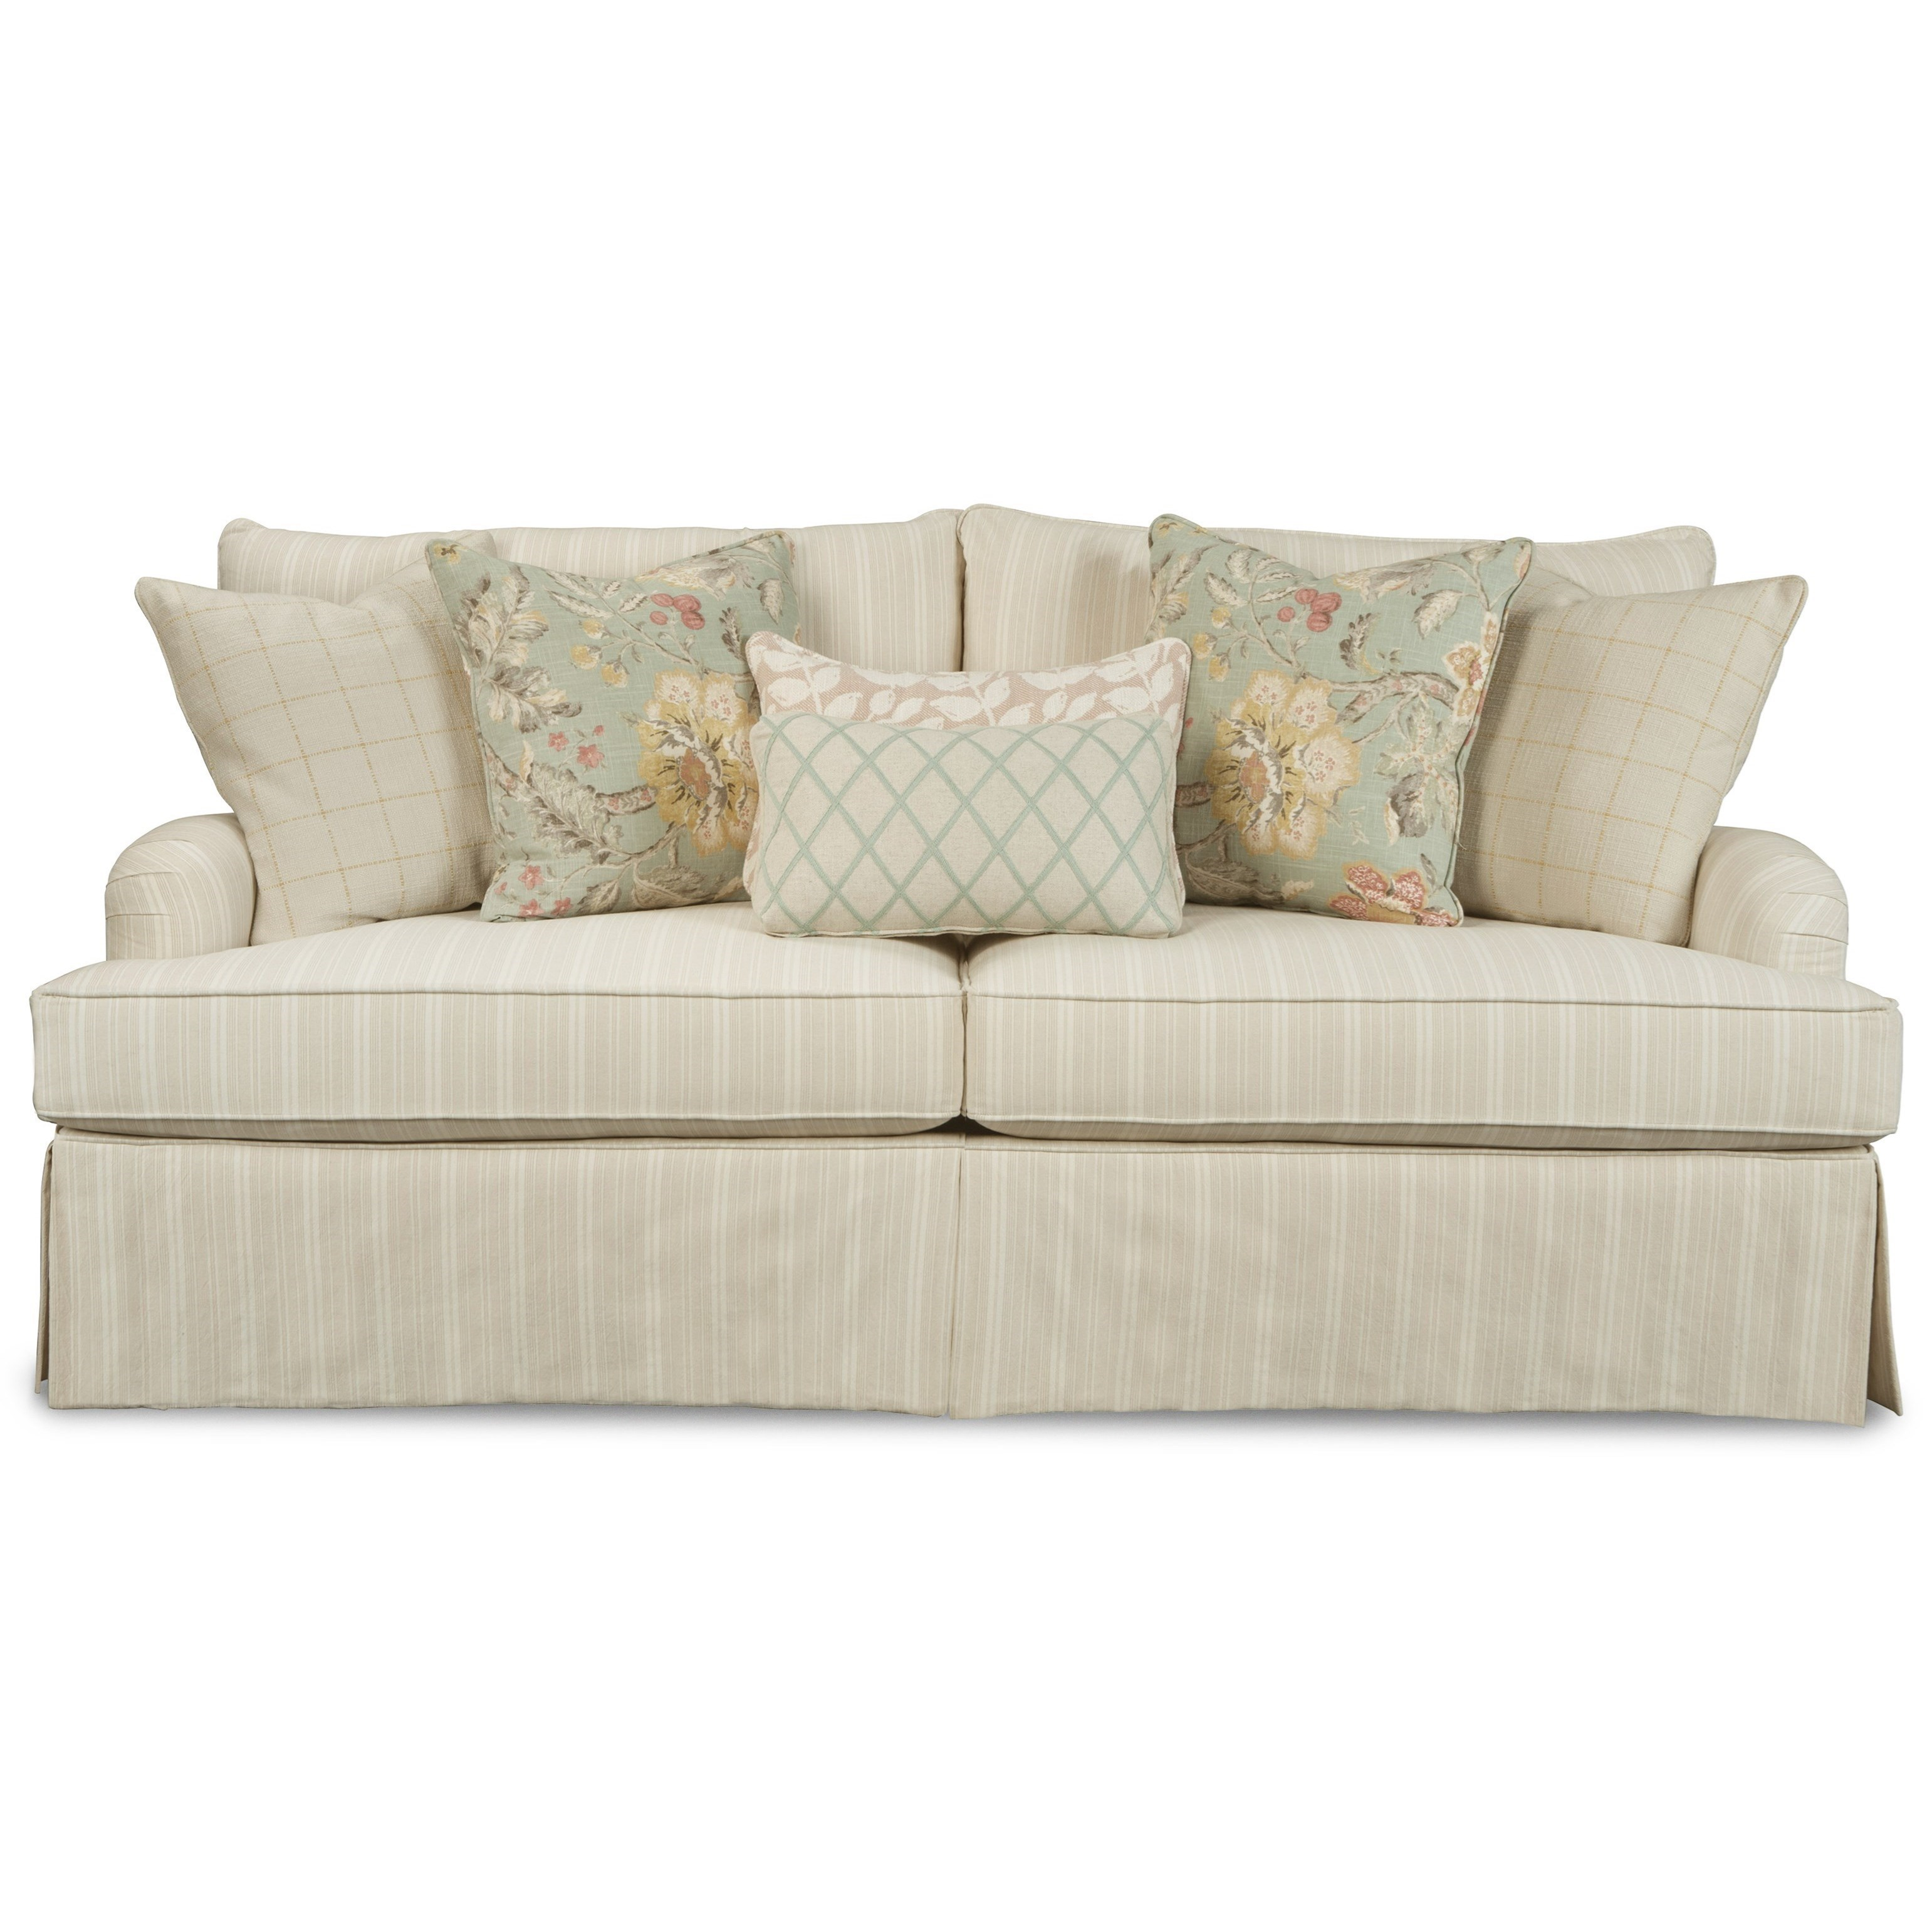 Bon Paula Deen By Craftmaster P973650BD98 Inch Sofa